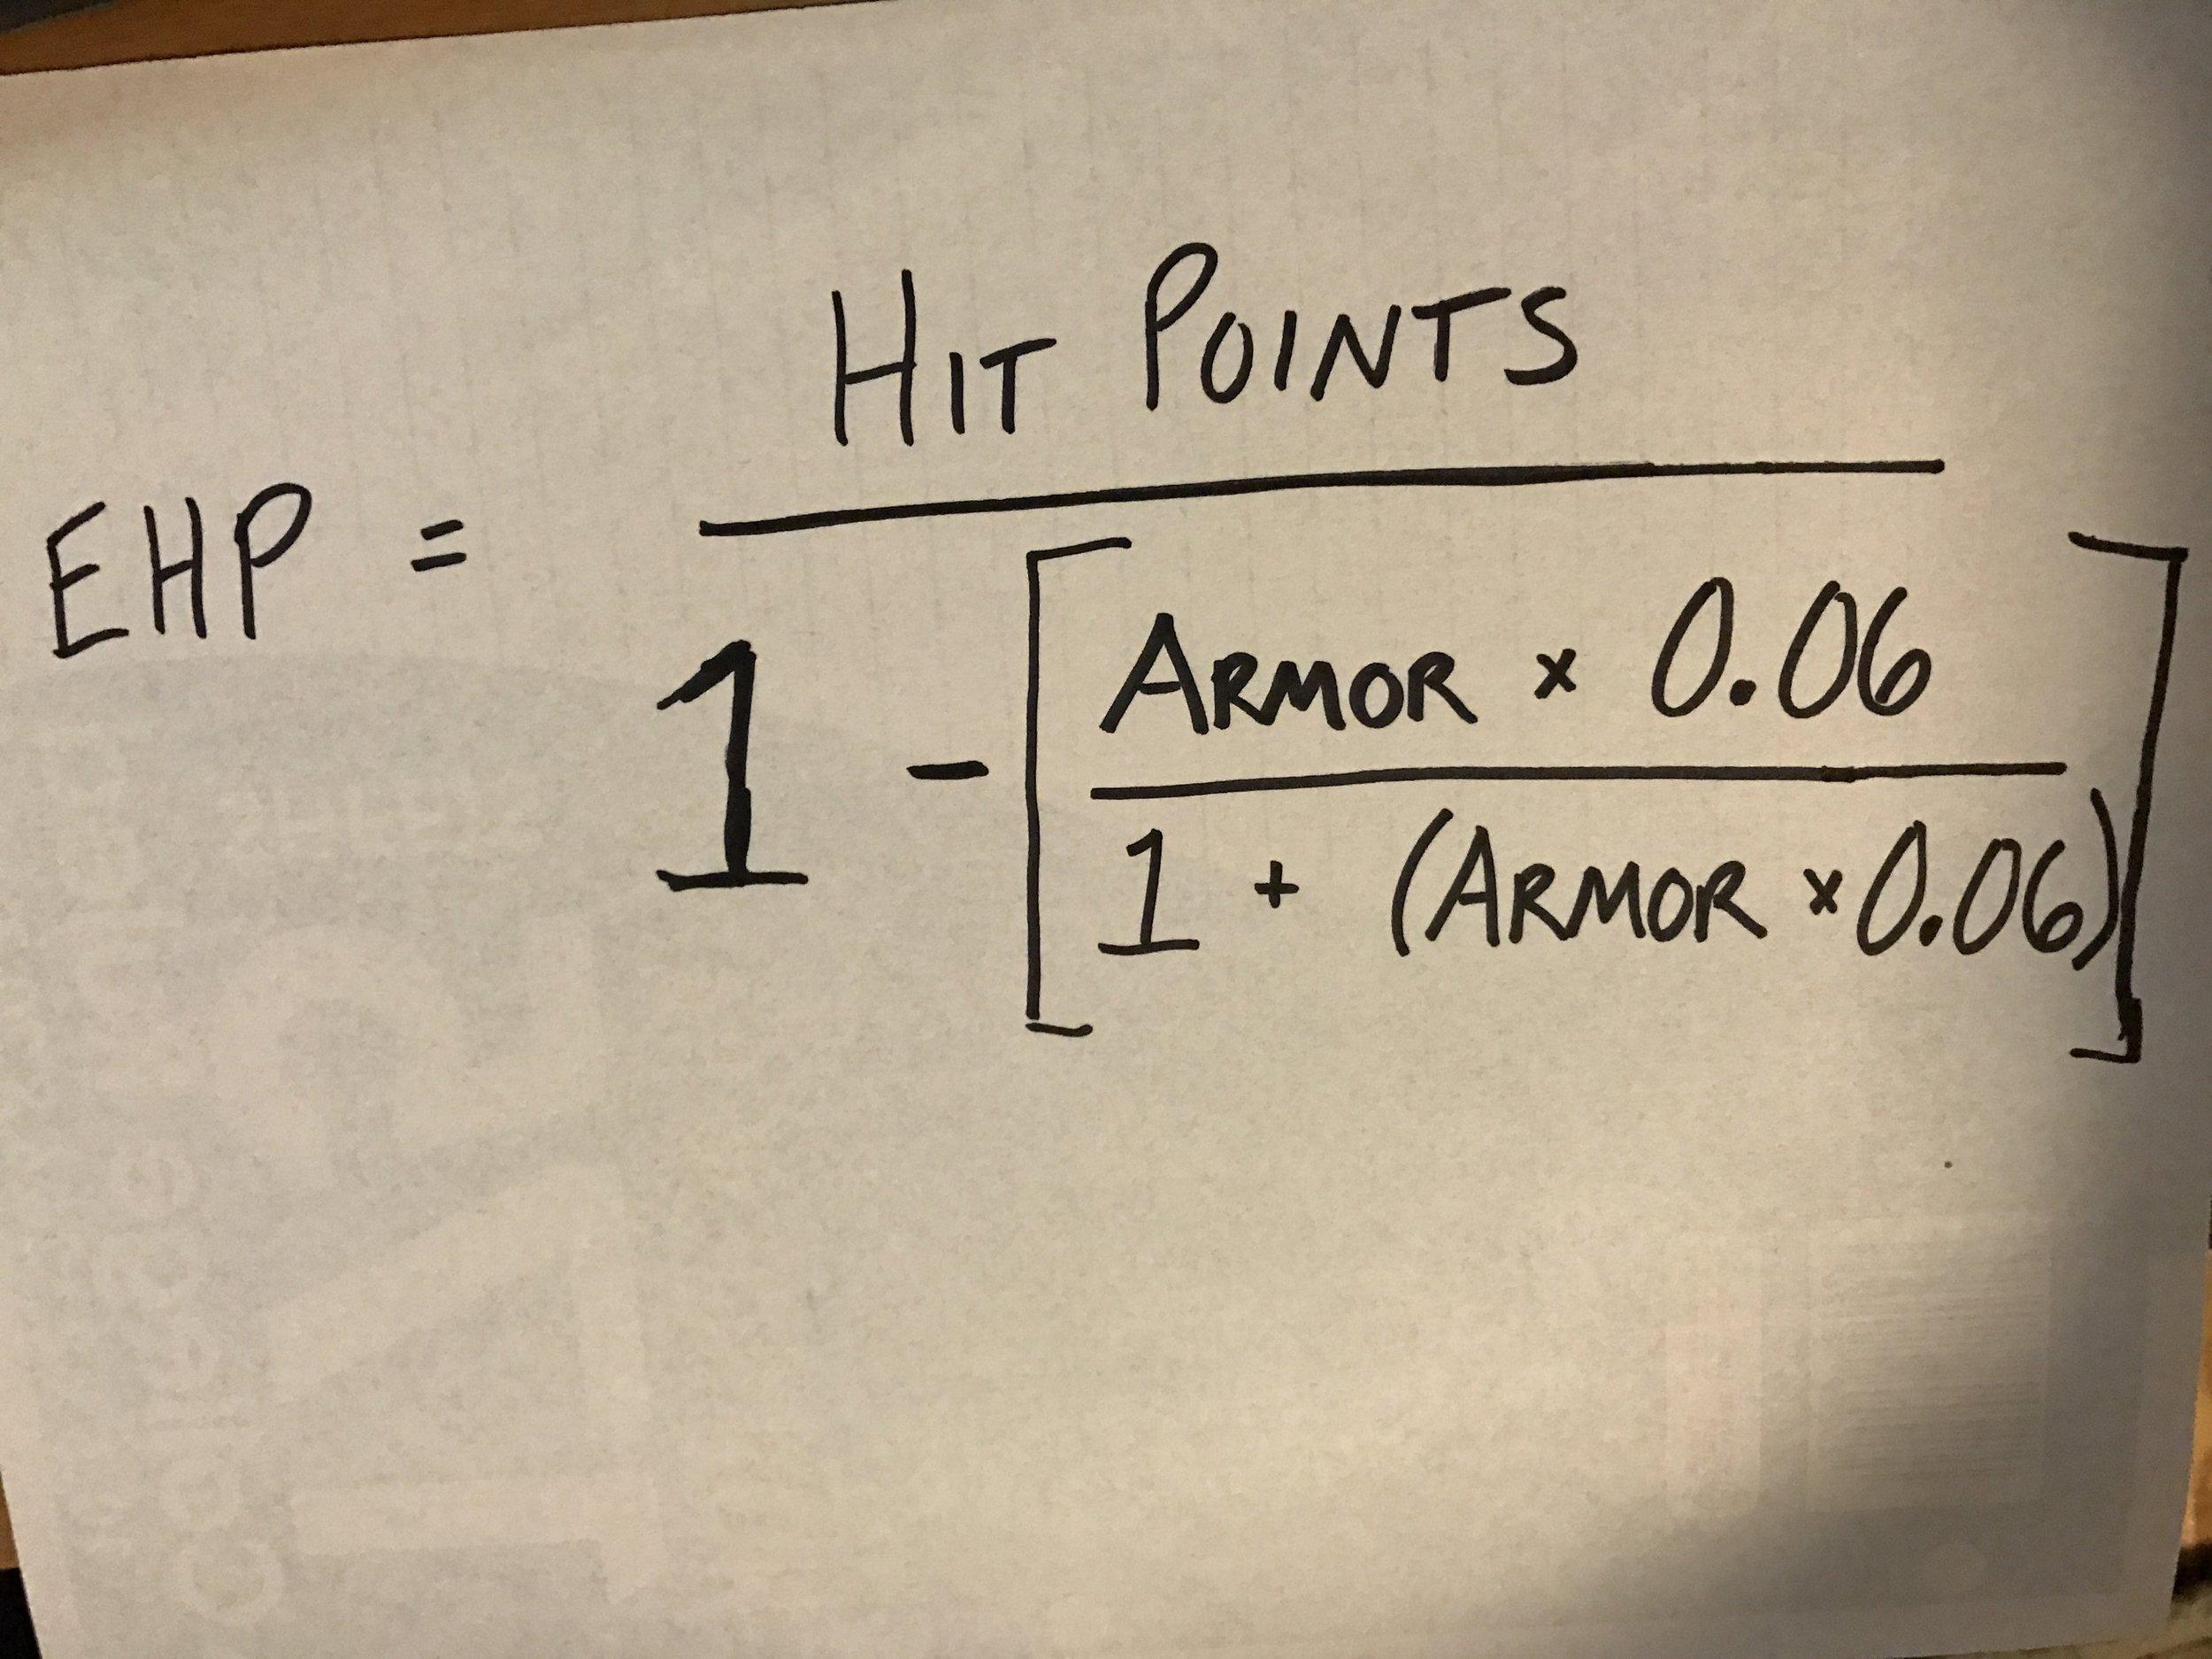 Effective HP!